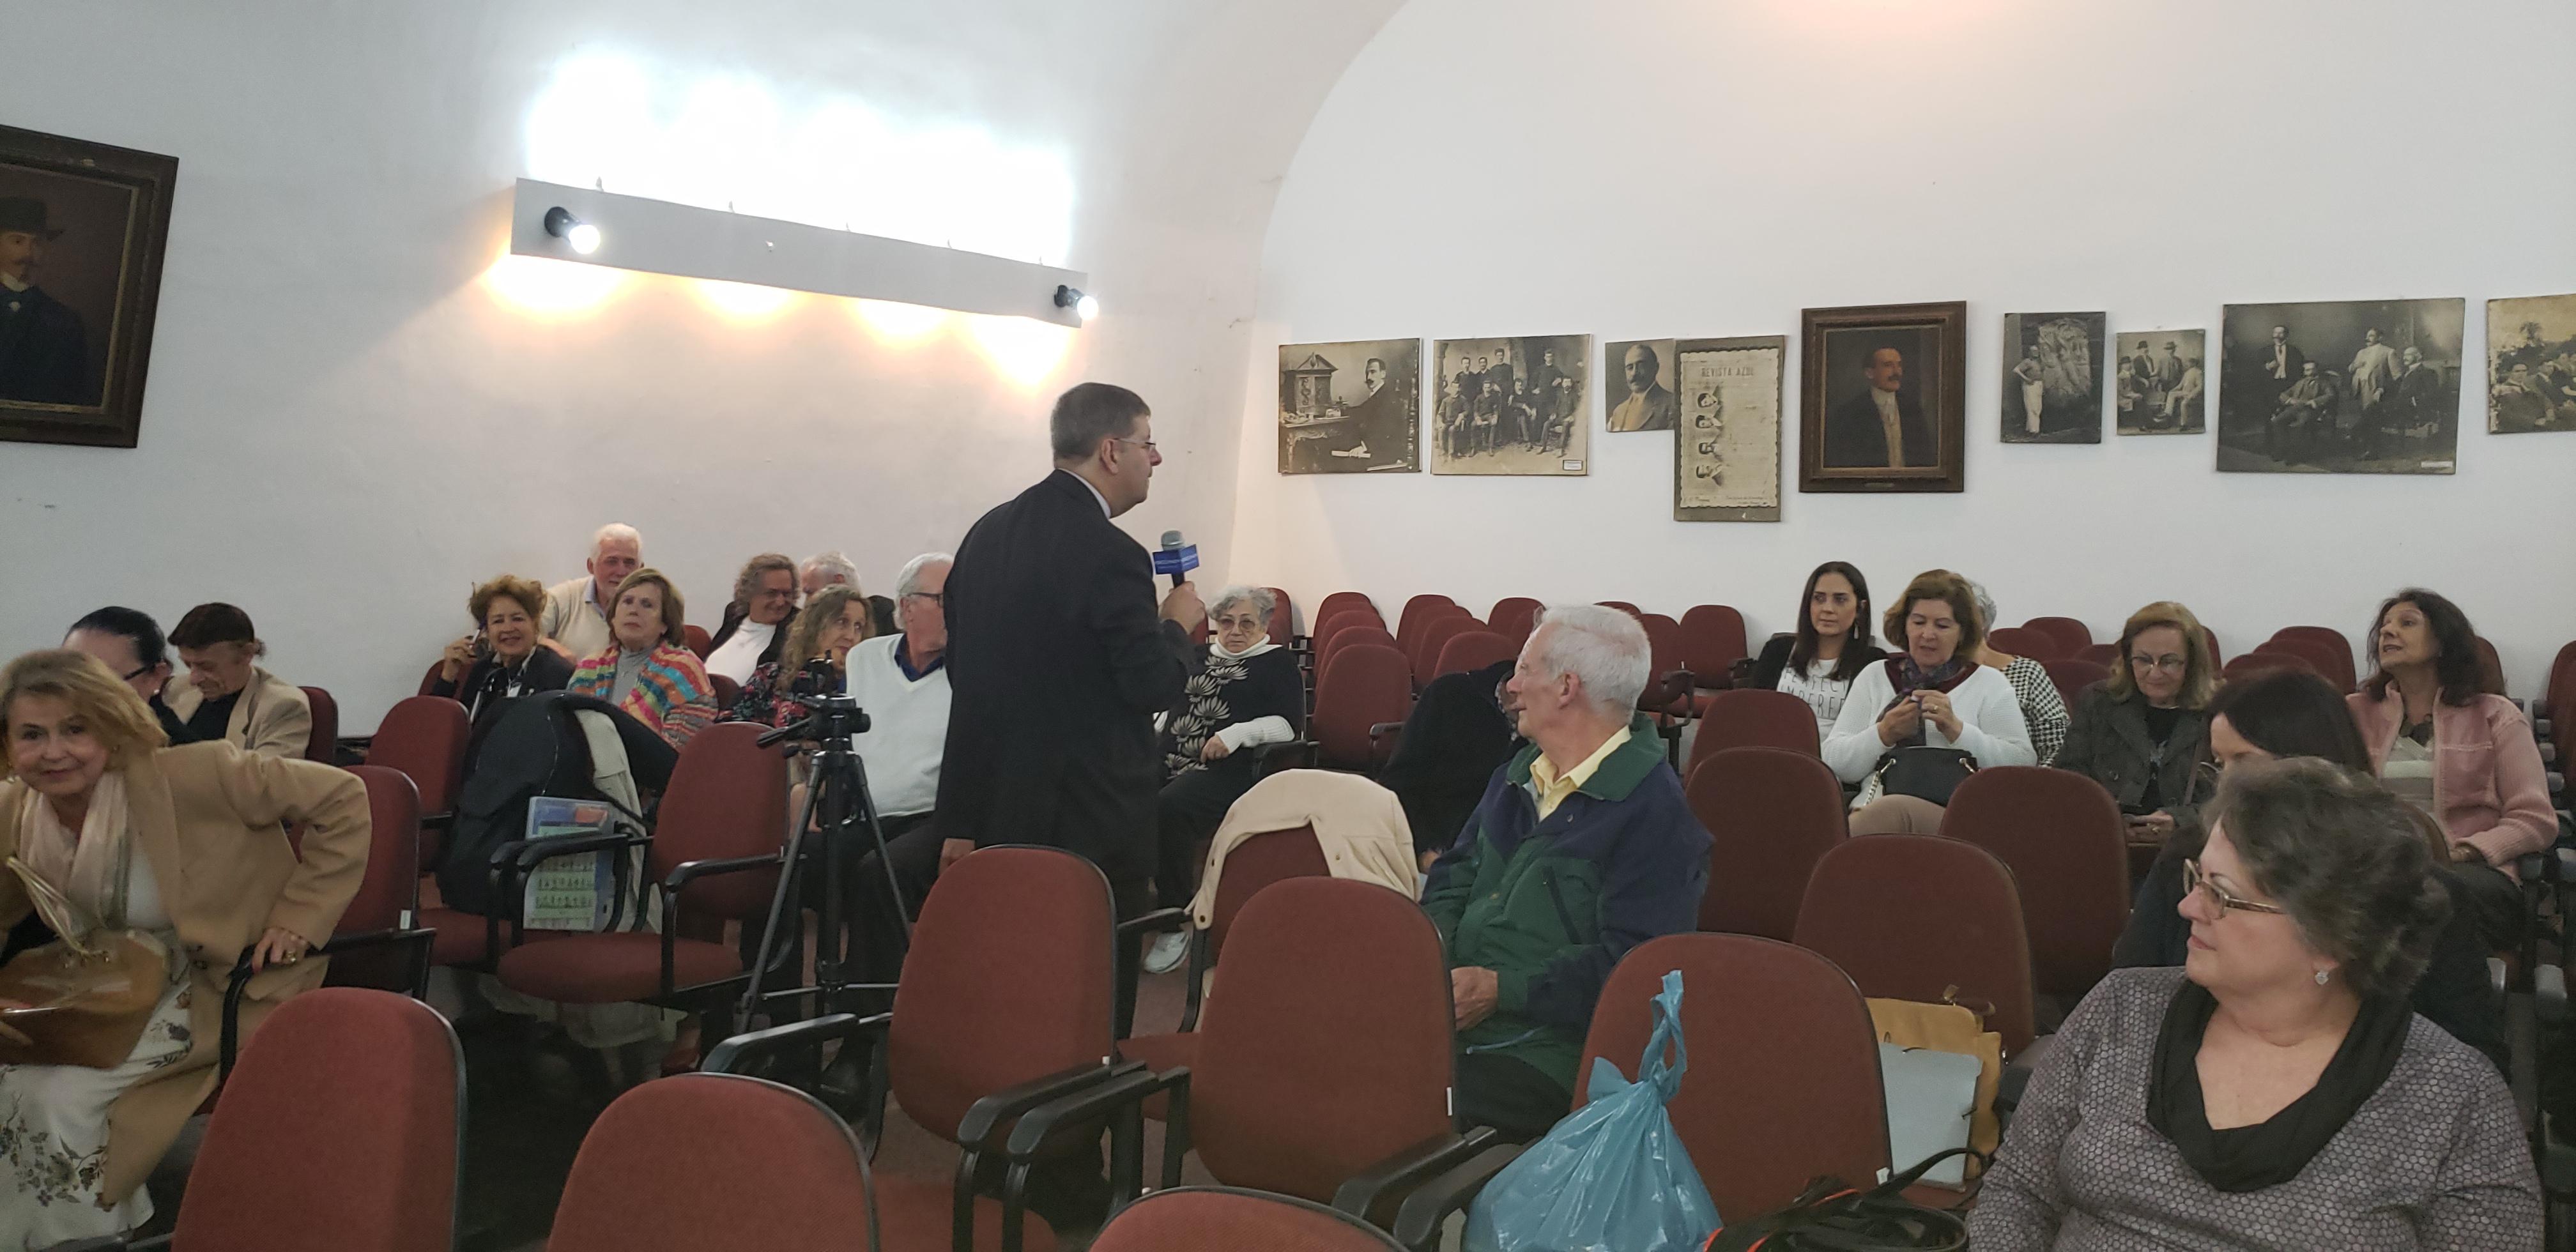 Flagrantes da palestra sobre Economia da Oralidade no Centro de Letras do Paraná